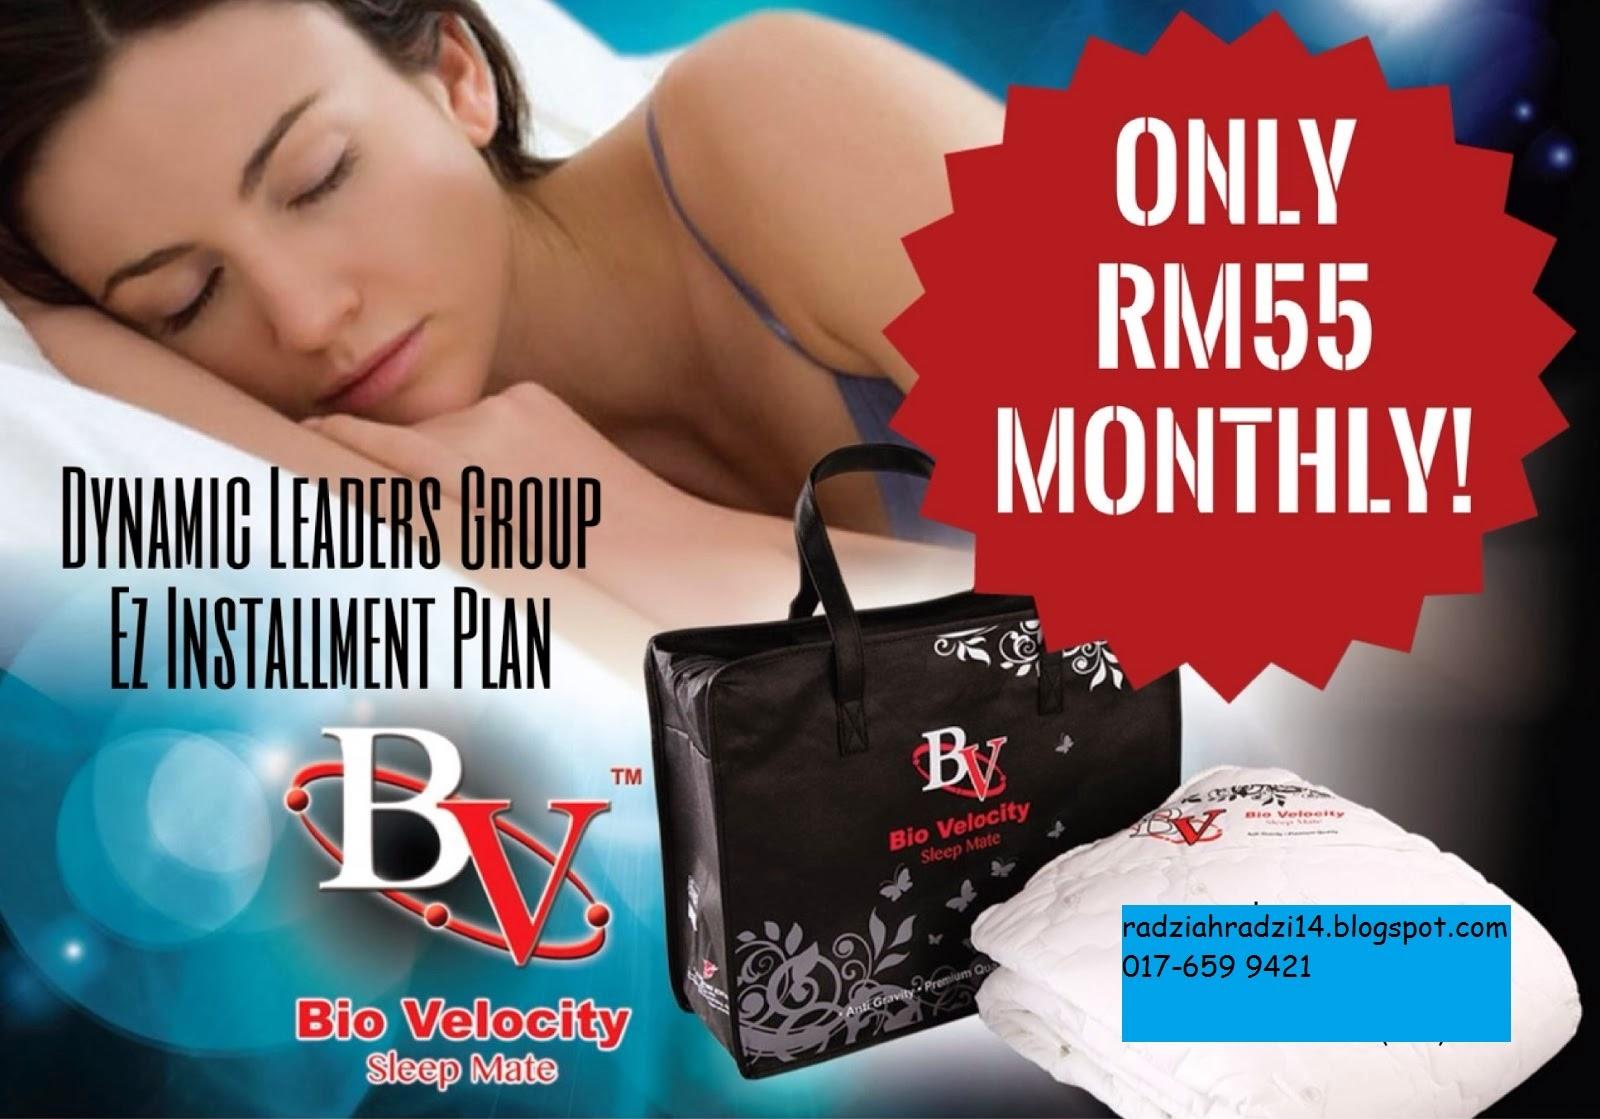 bvsm, biovelocity sleepmate,insomnia,deep sleep, garam buluh